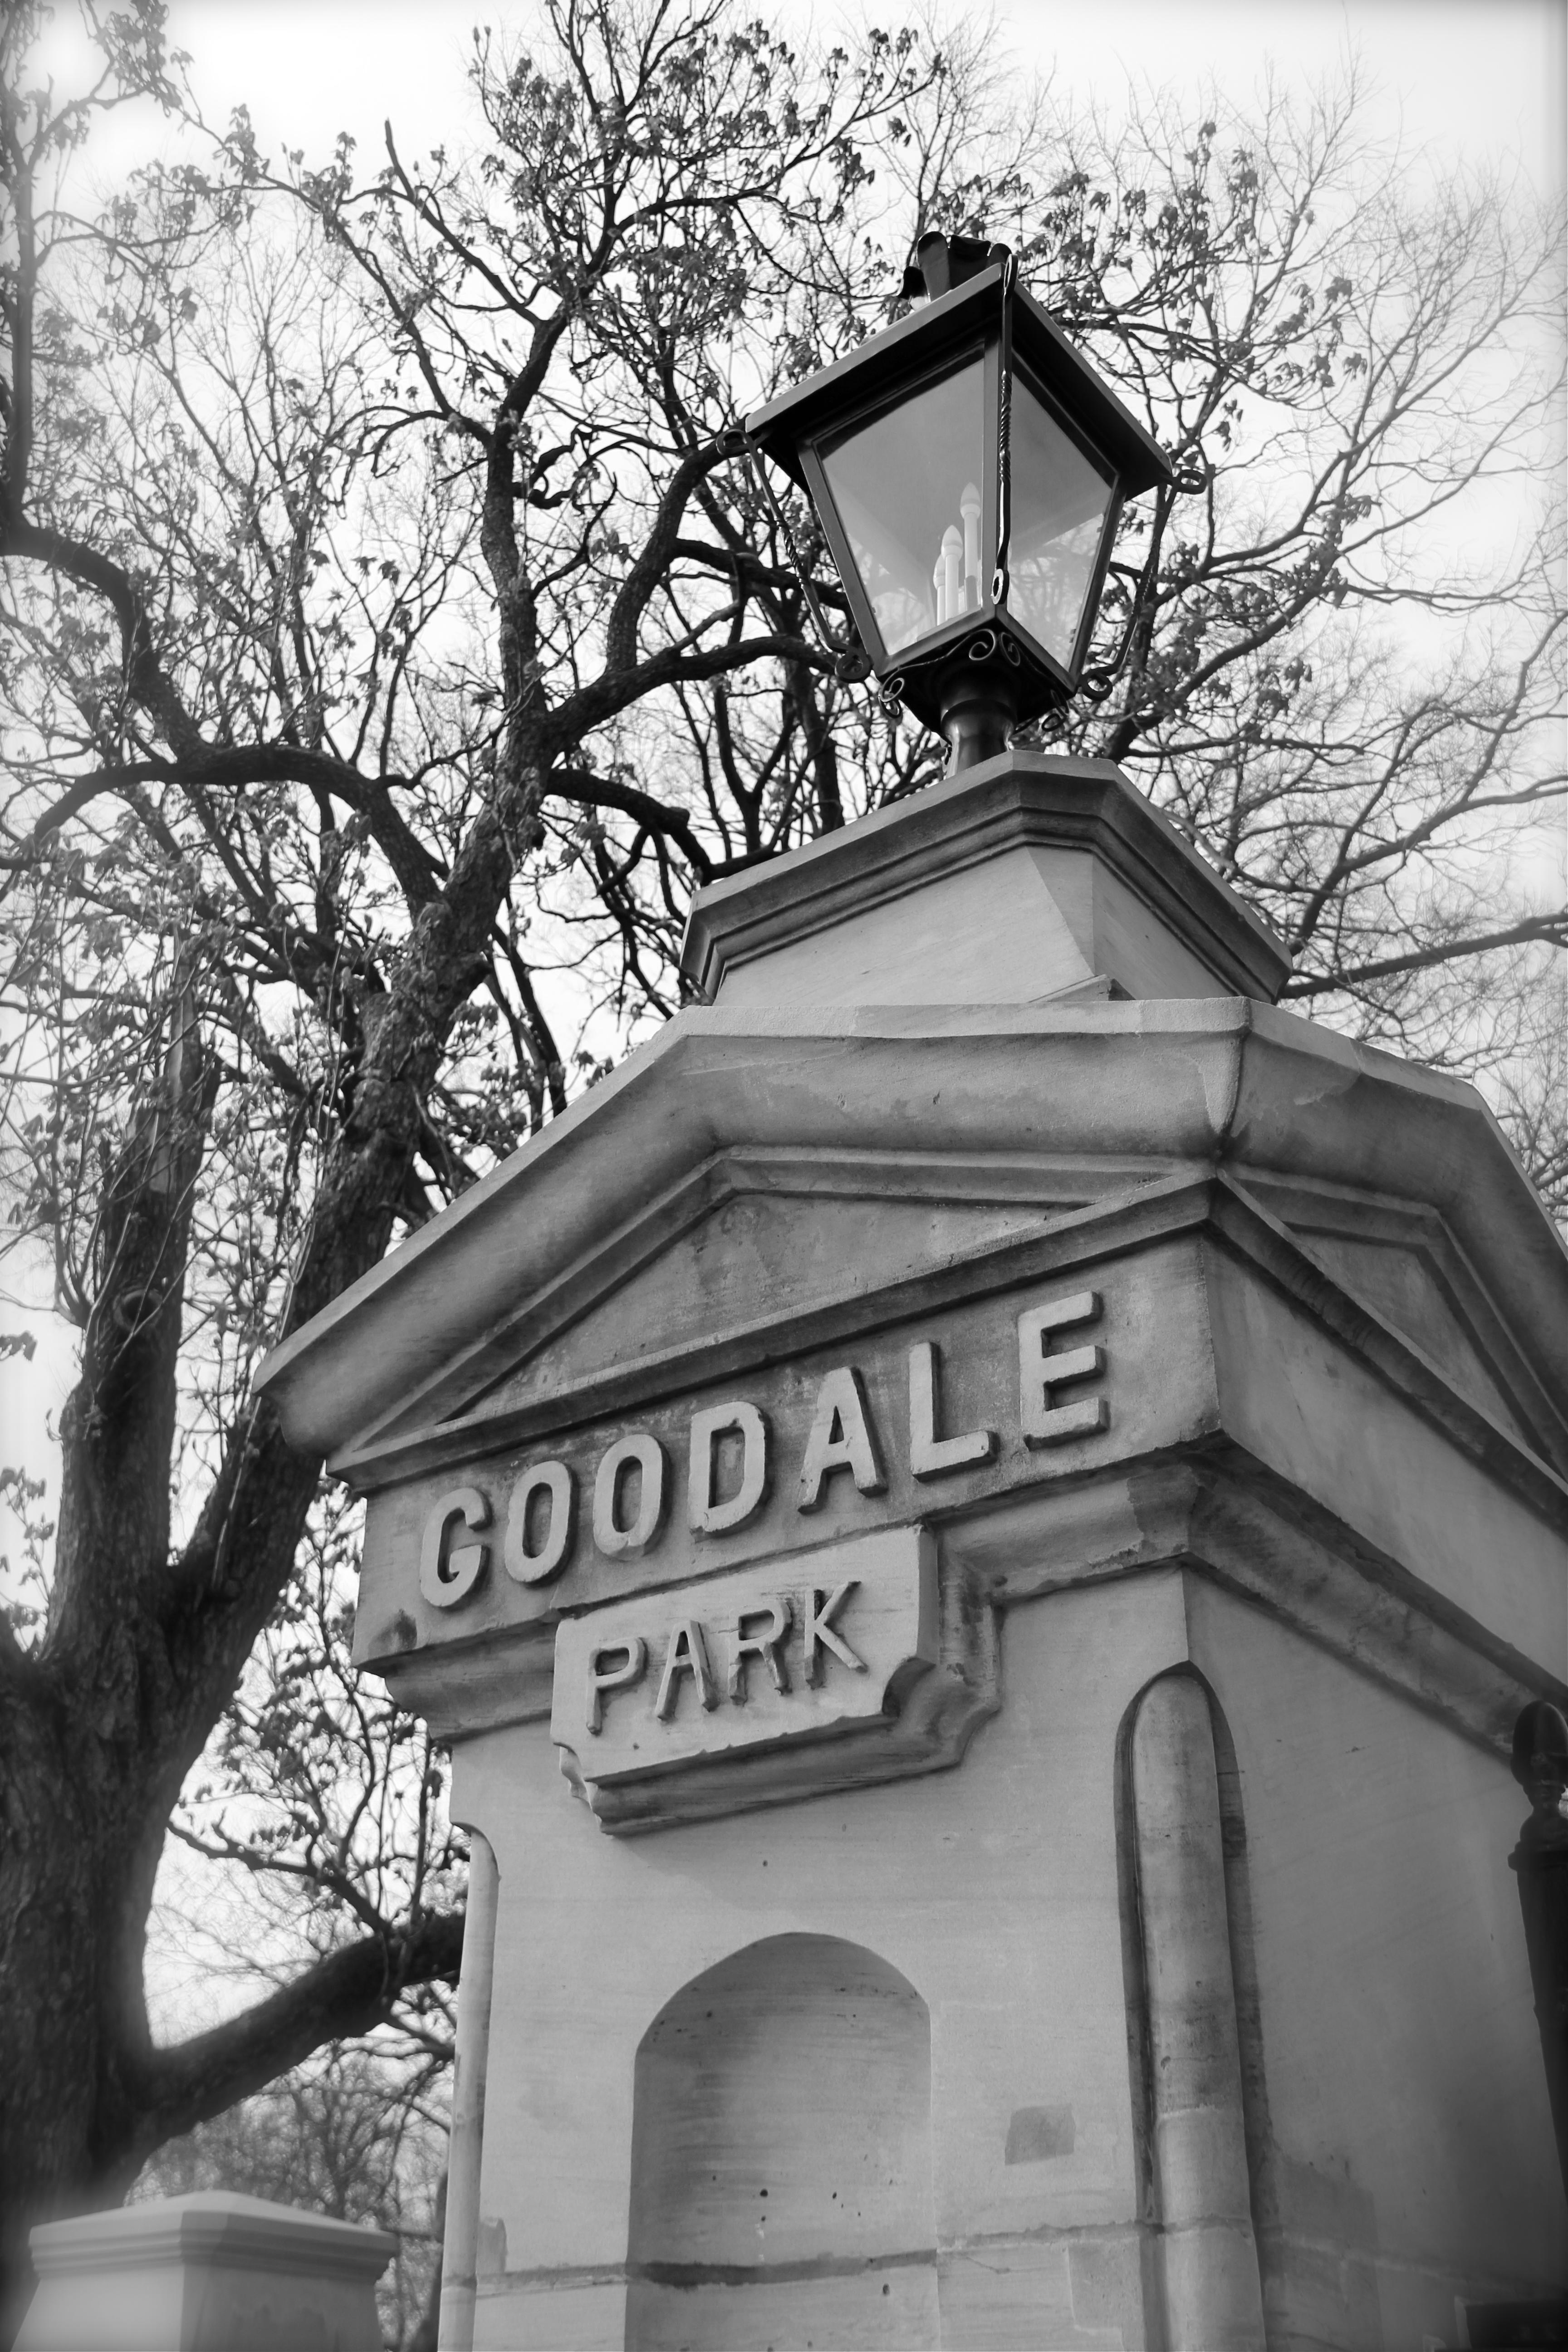 Goodale_Park_girl_about_columbus_Columbus_Ohio